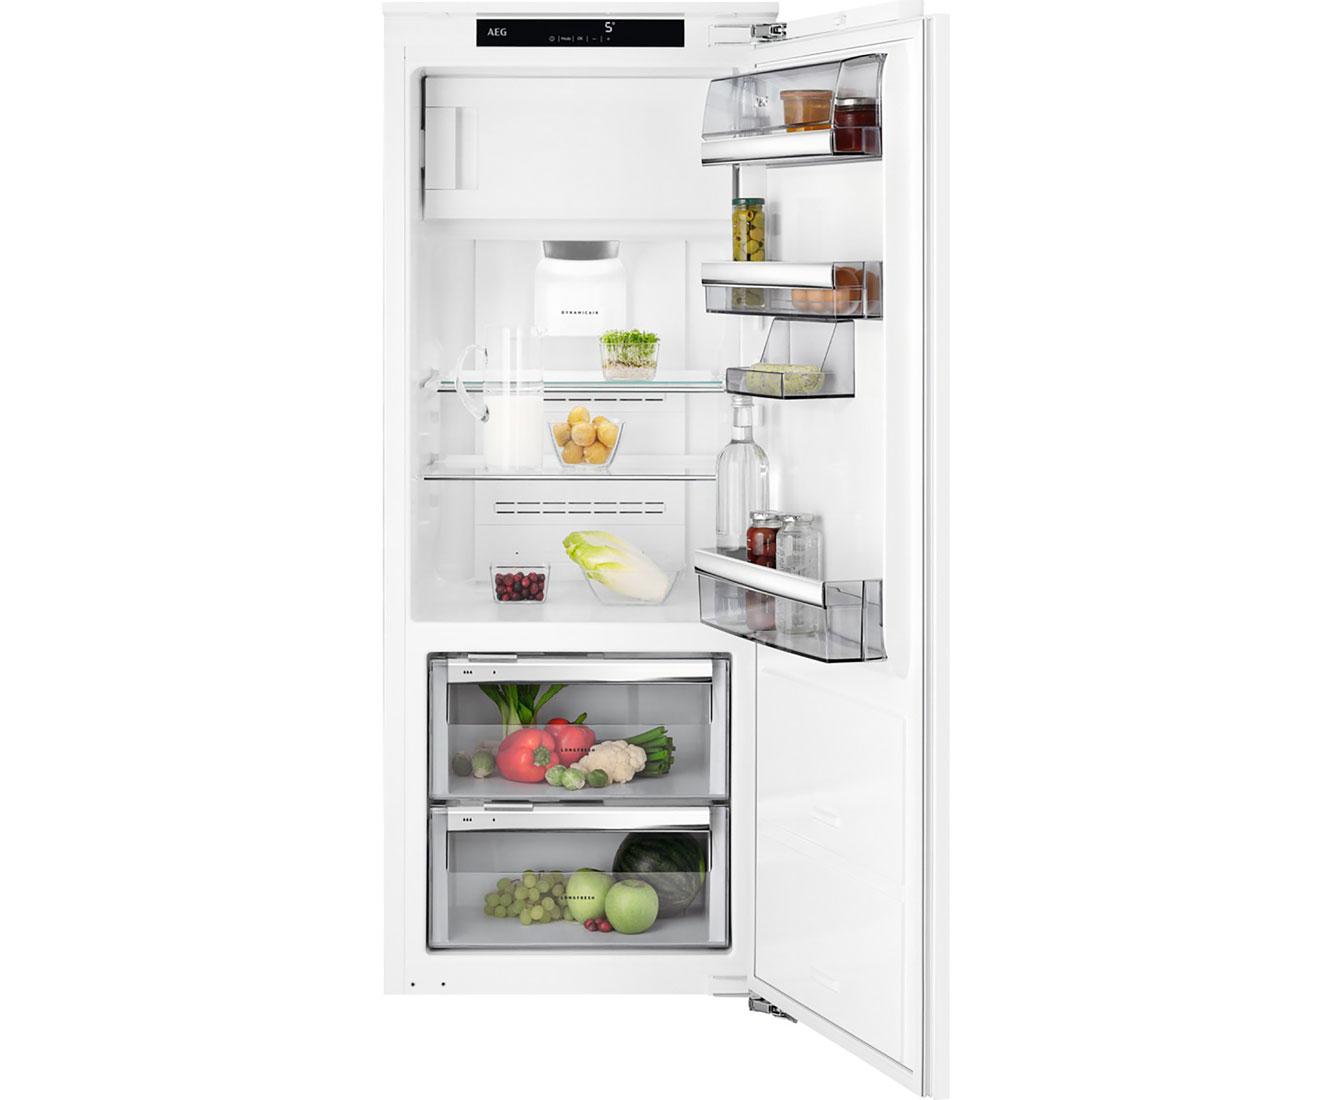 Aeg Kühlschrank Ohne Gefrierfach : Aeg sfe81436zc einbau kühlschrank mit gefrierfach 140er nische